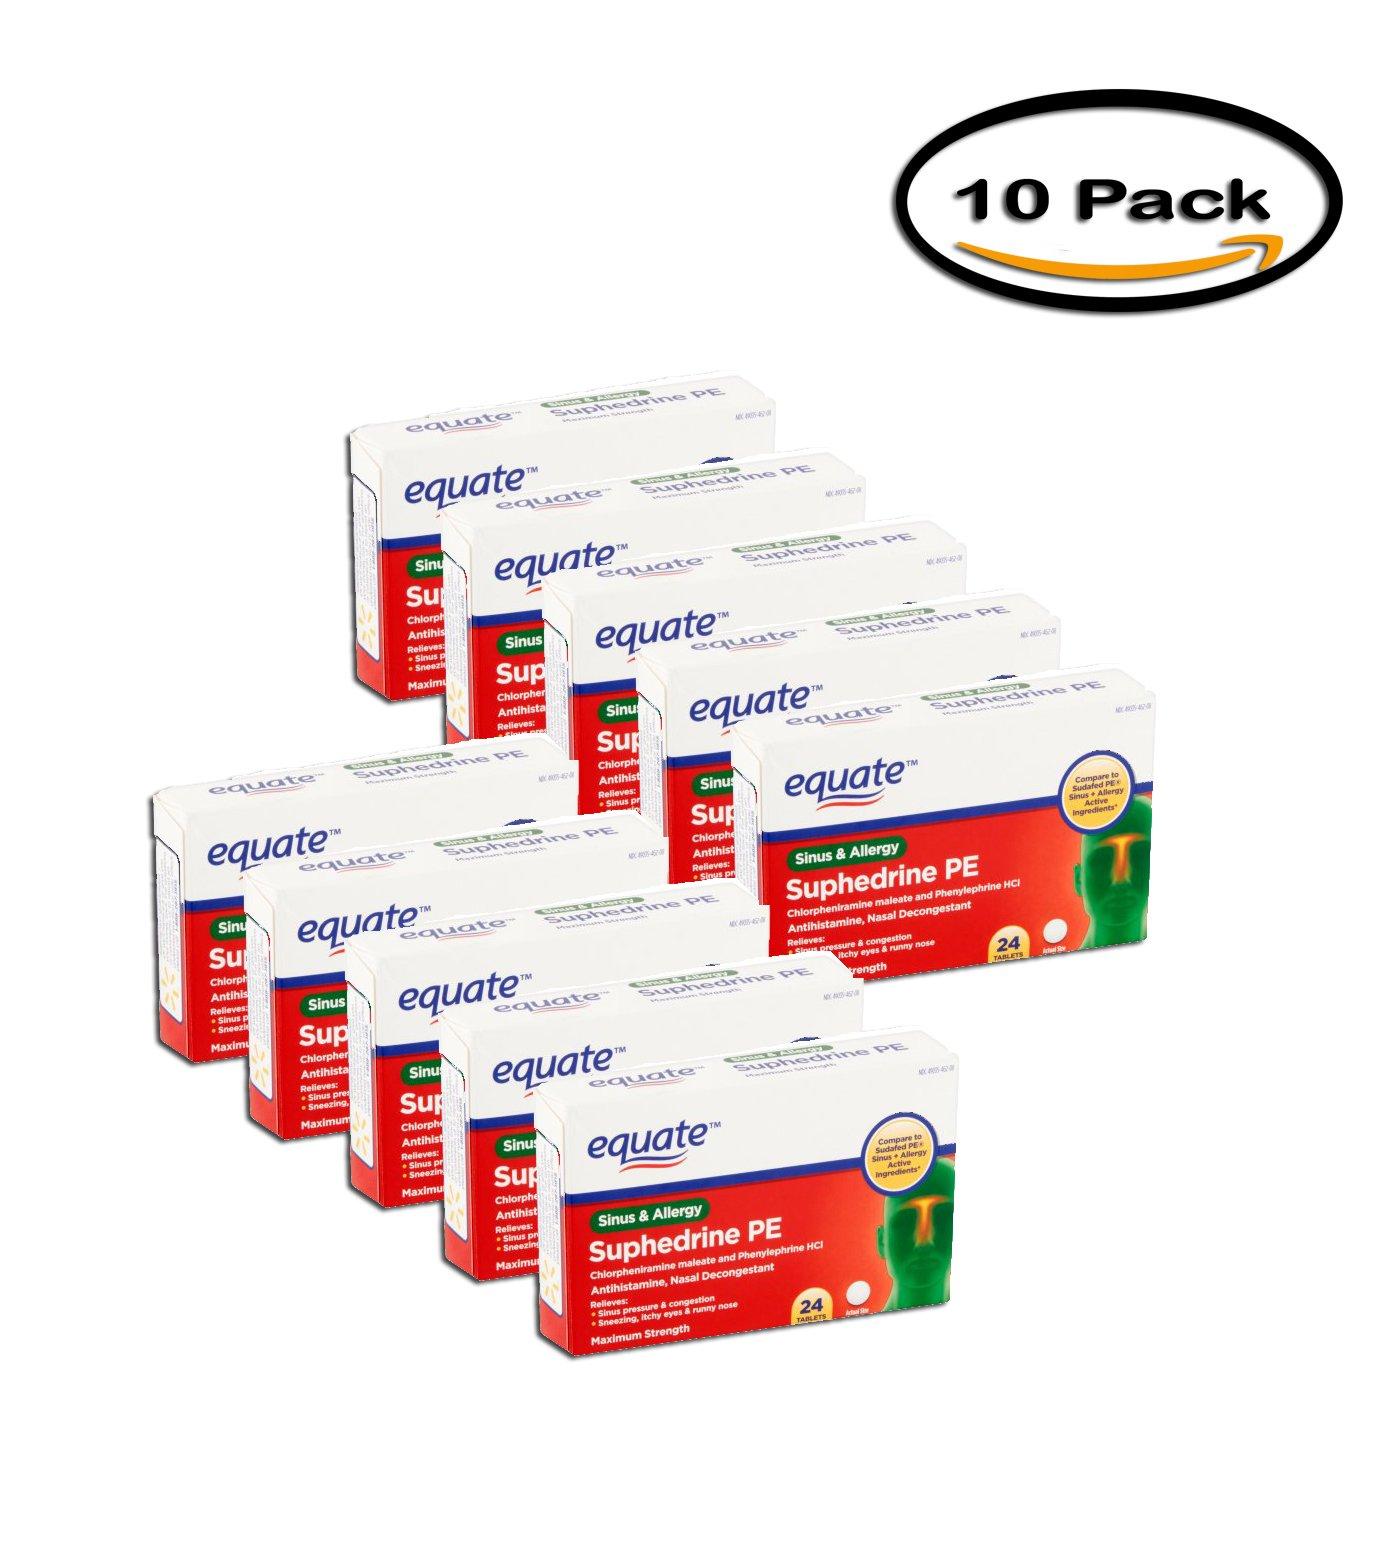 PACK OF 10 - Equate Suphedrine PE Sinus & Allergy Antihistamine/Nasal Decongestant Tablets, 24 ct by Equate